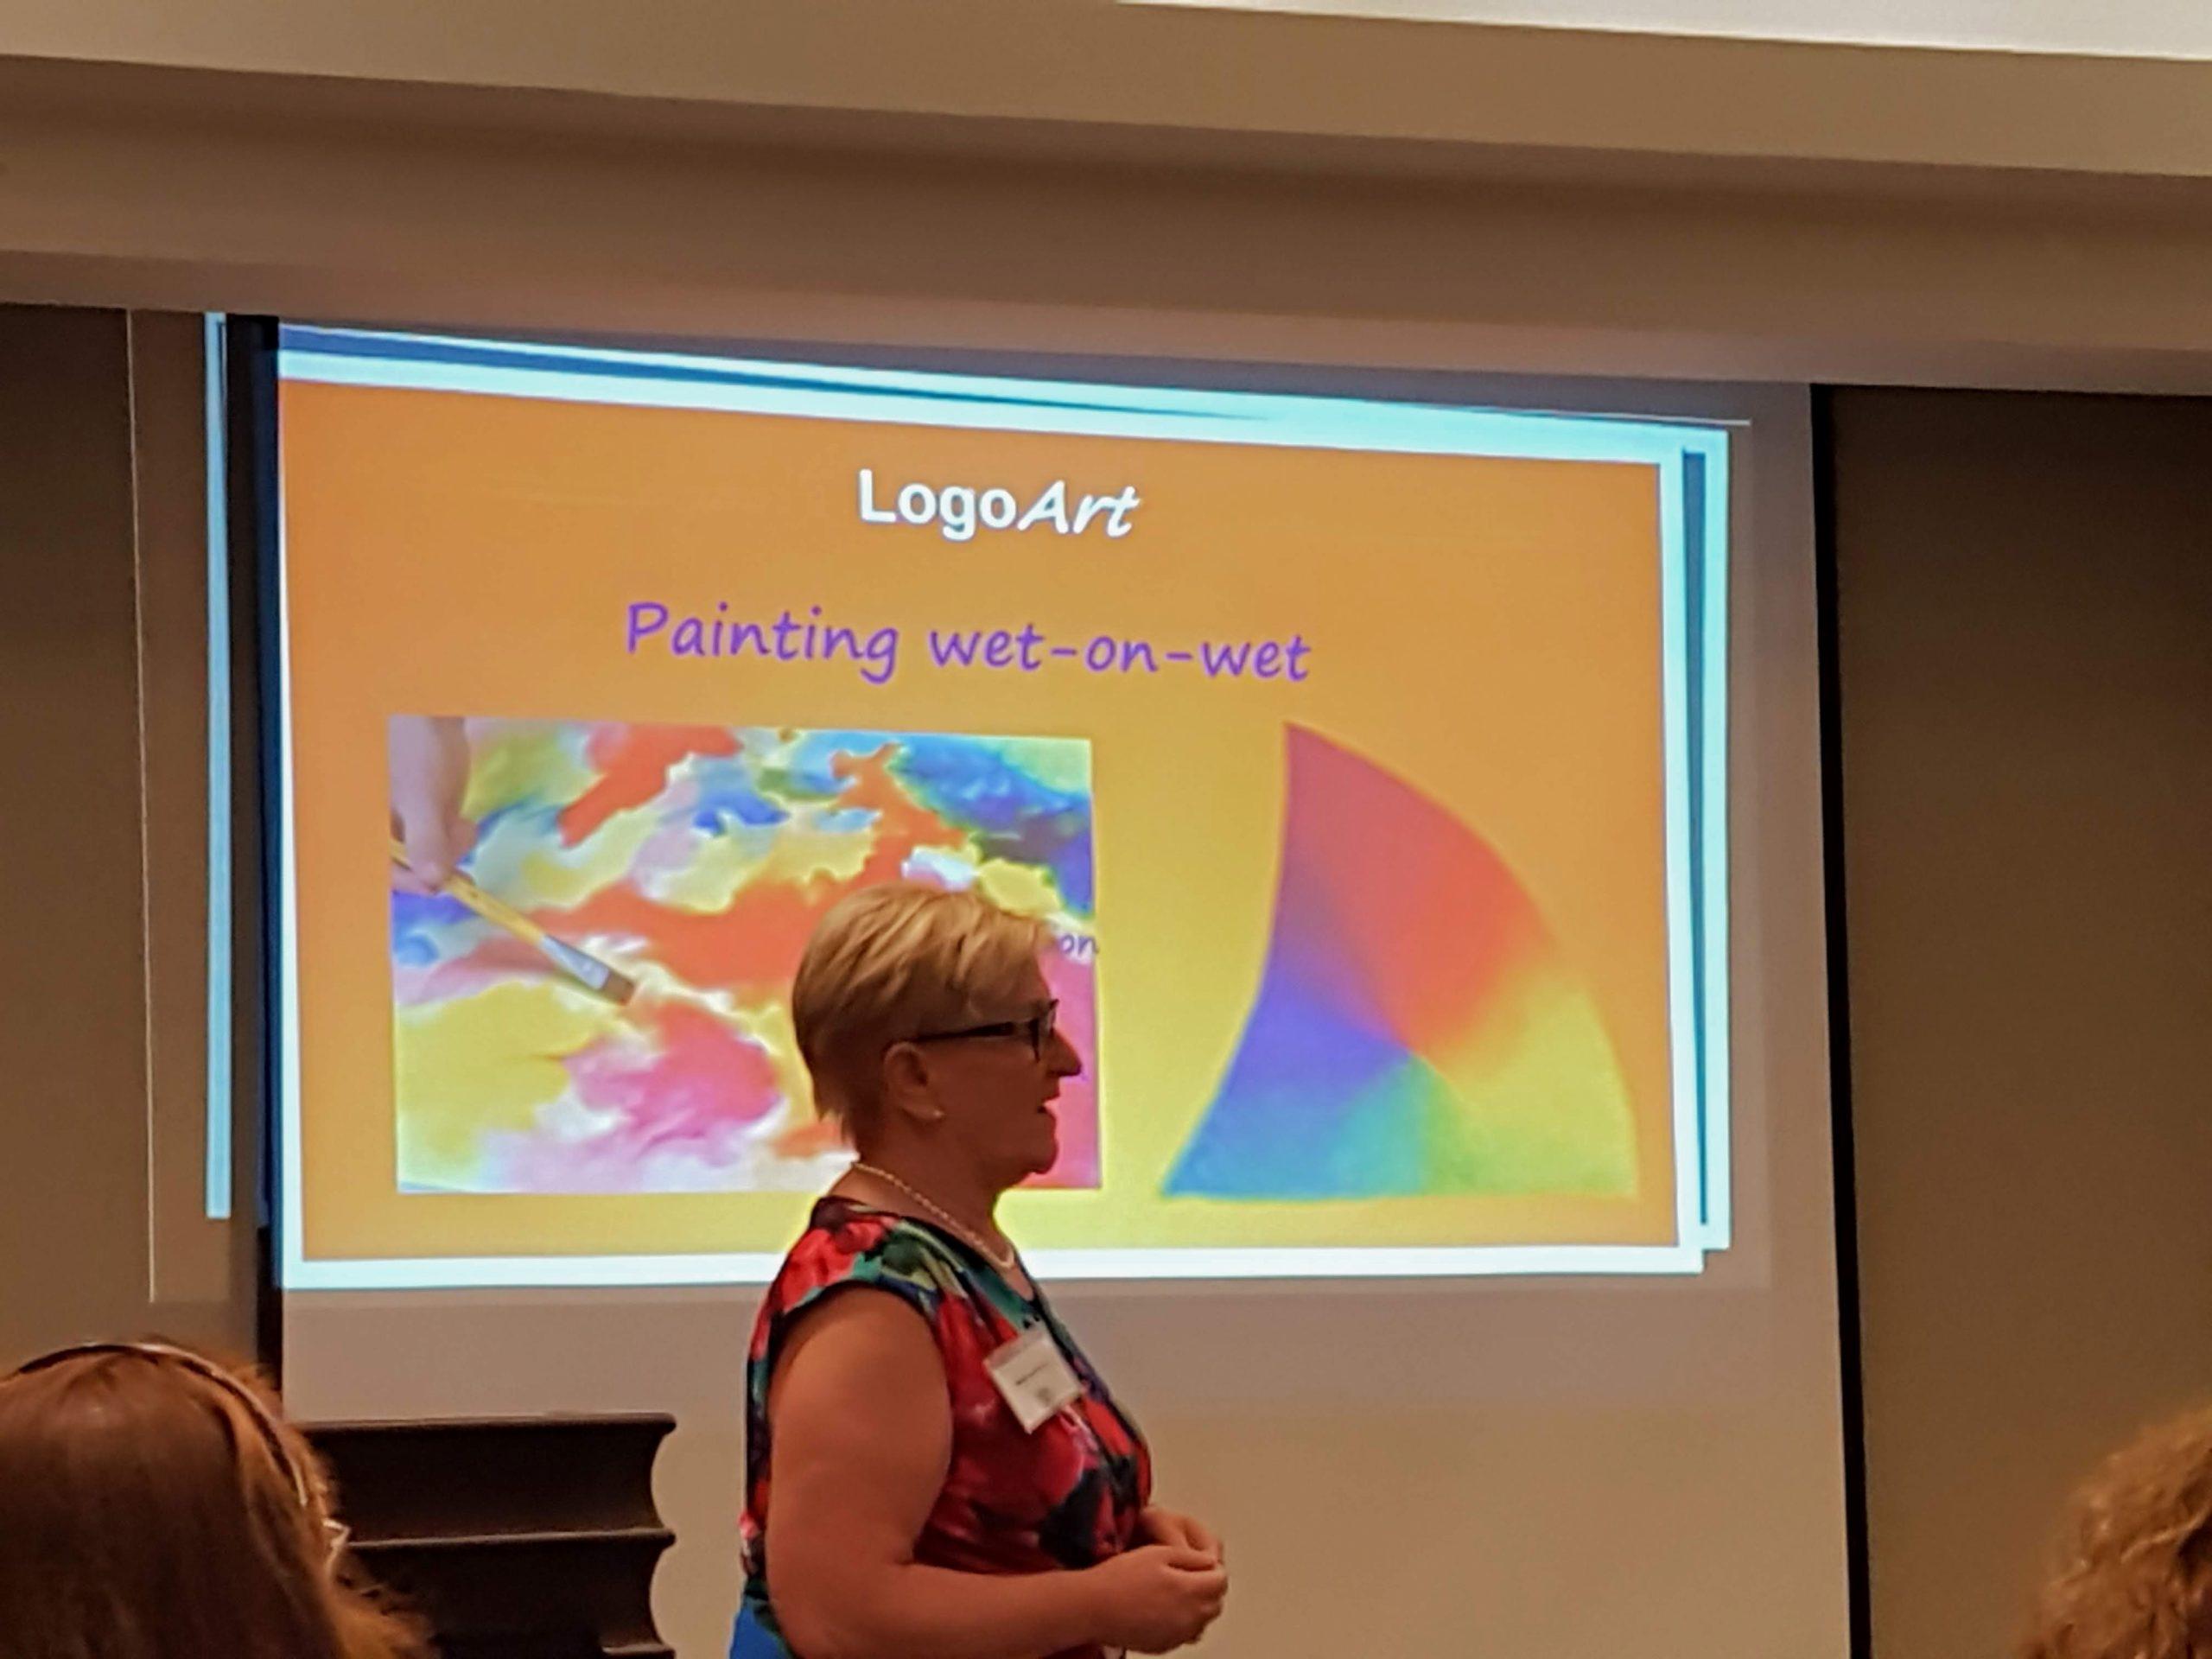 IRMELI LEHTIOKSA 22 Logotherapy World Congress Presentation